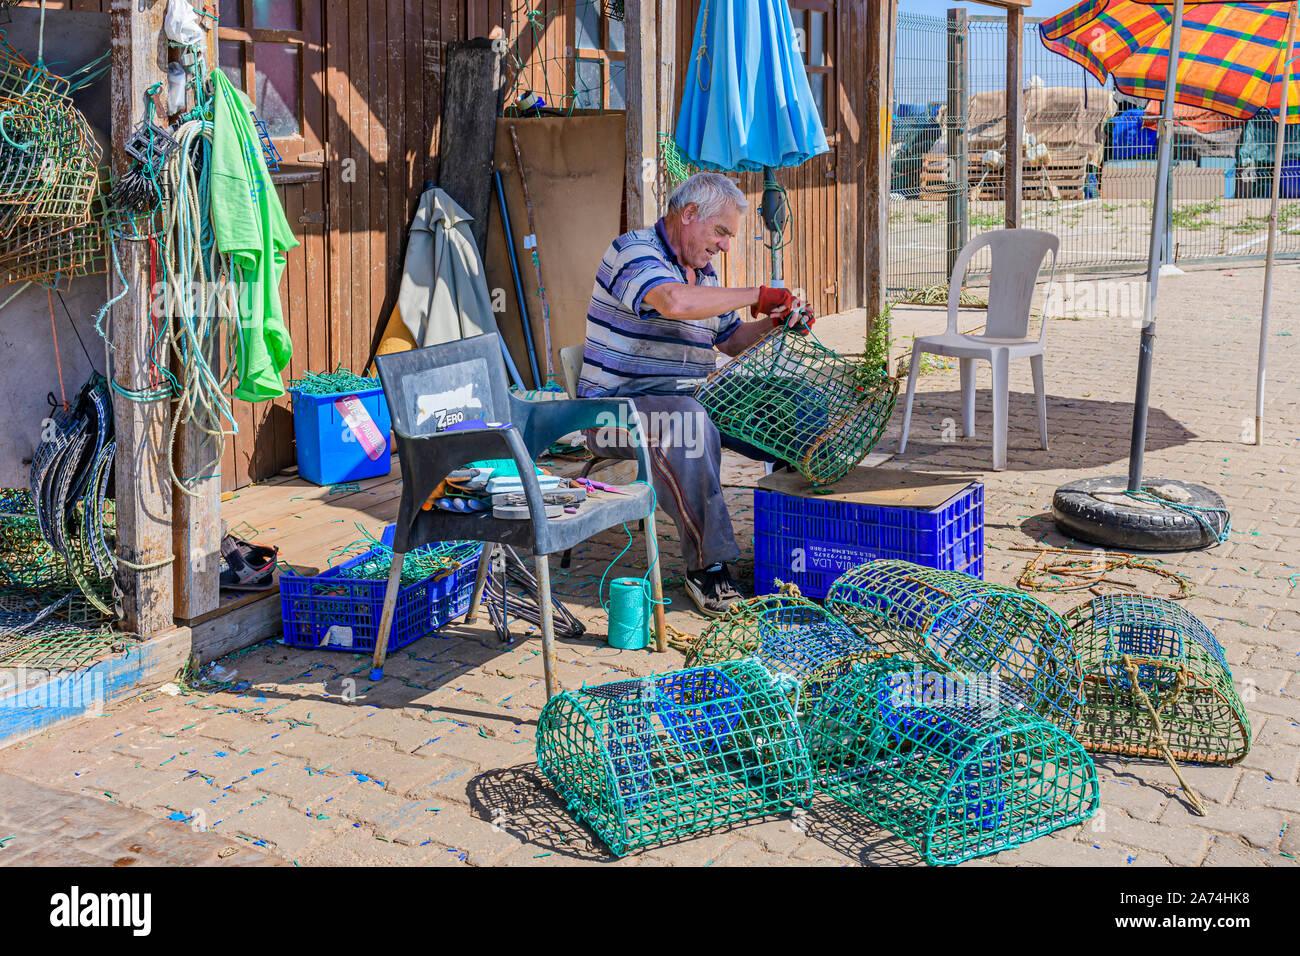 09.16.2019. Algarve, Portugal. Local fisherman repairing octopus traps, Santa Luzia, East Algarve Stock Photo